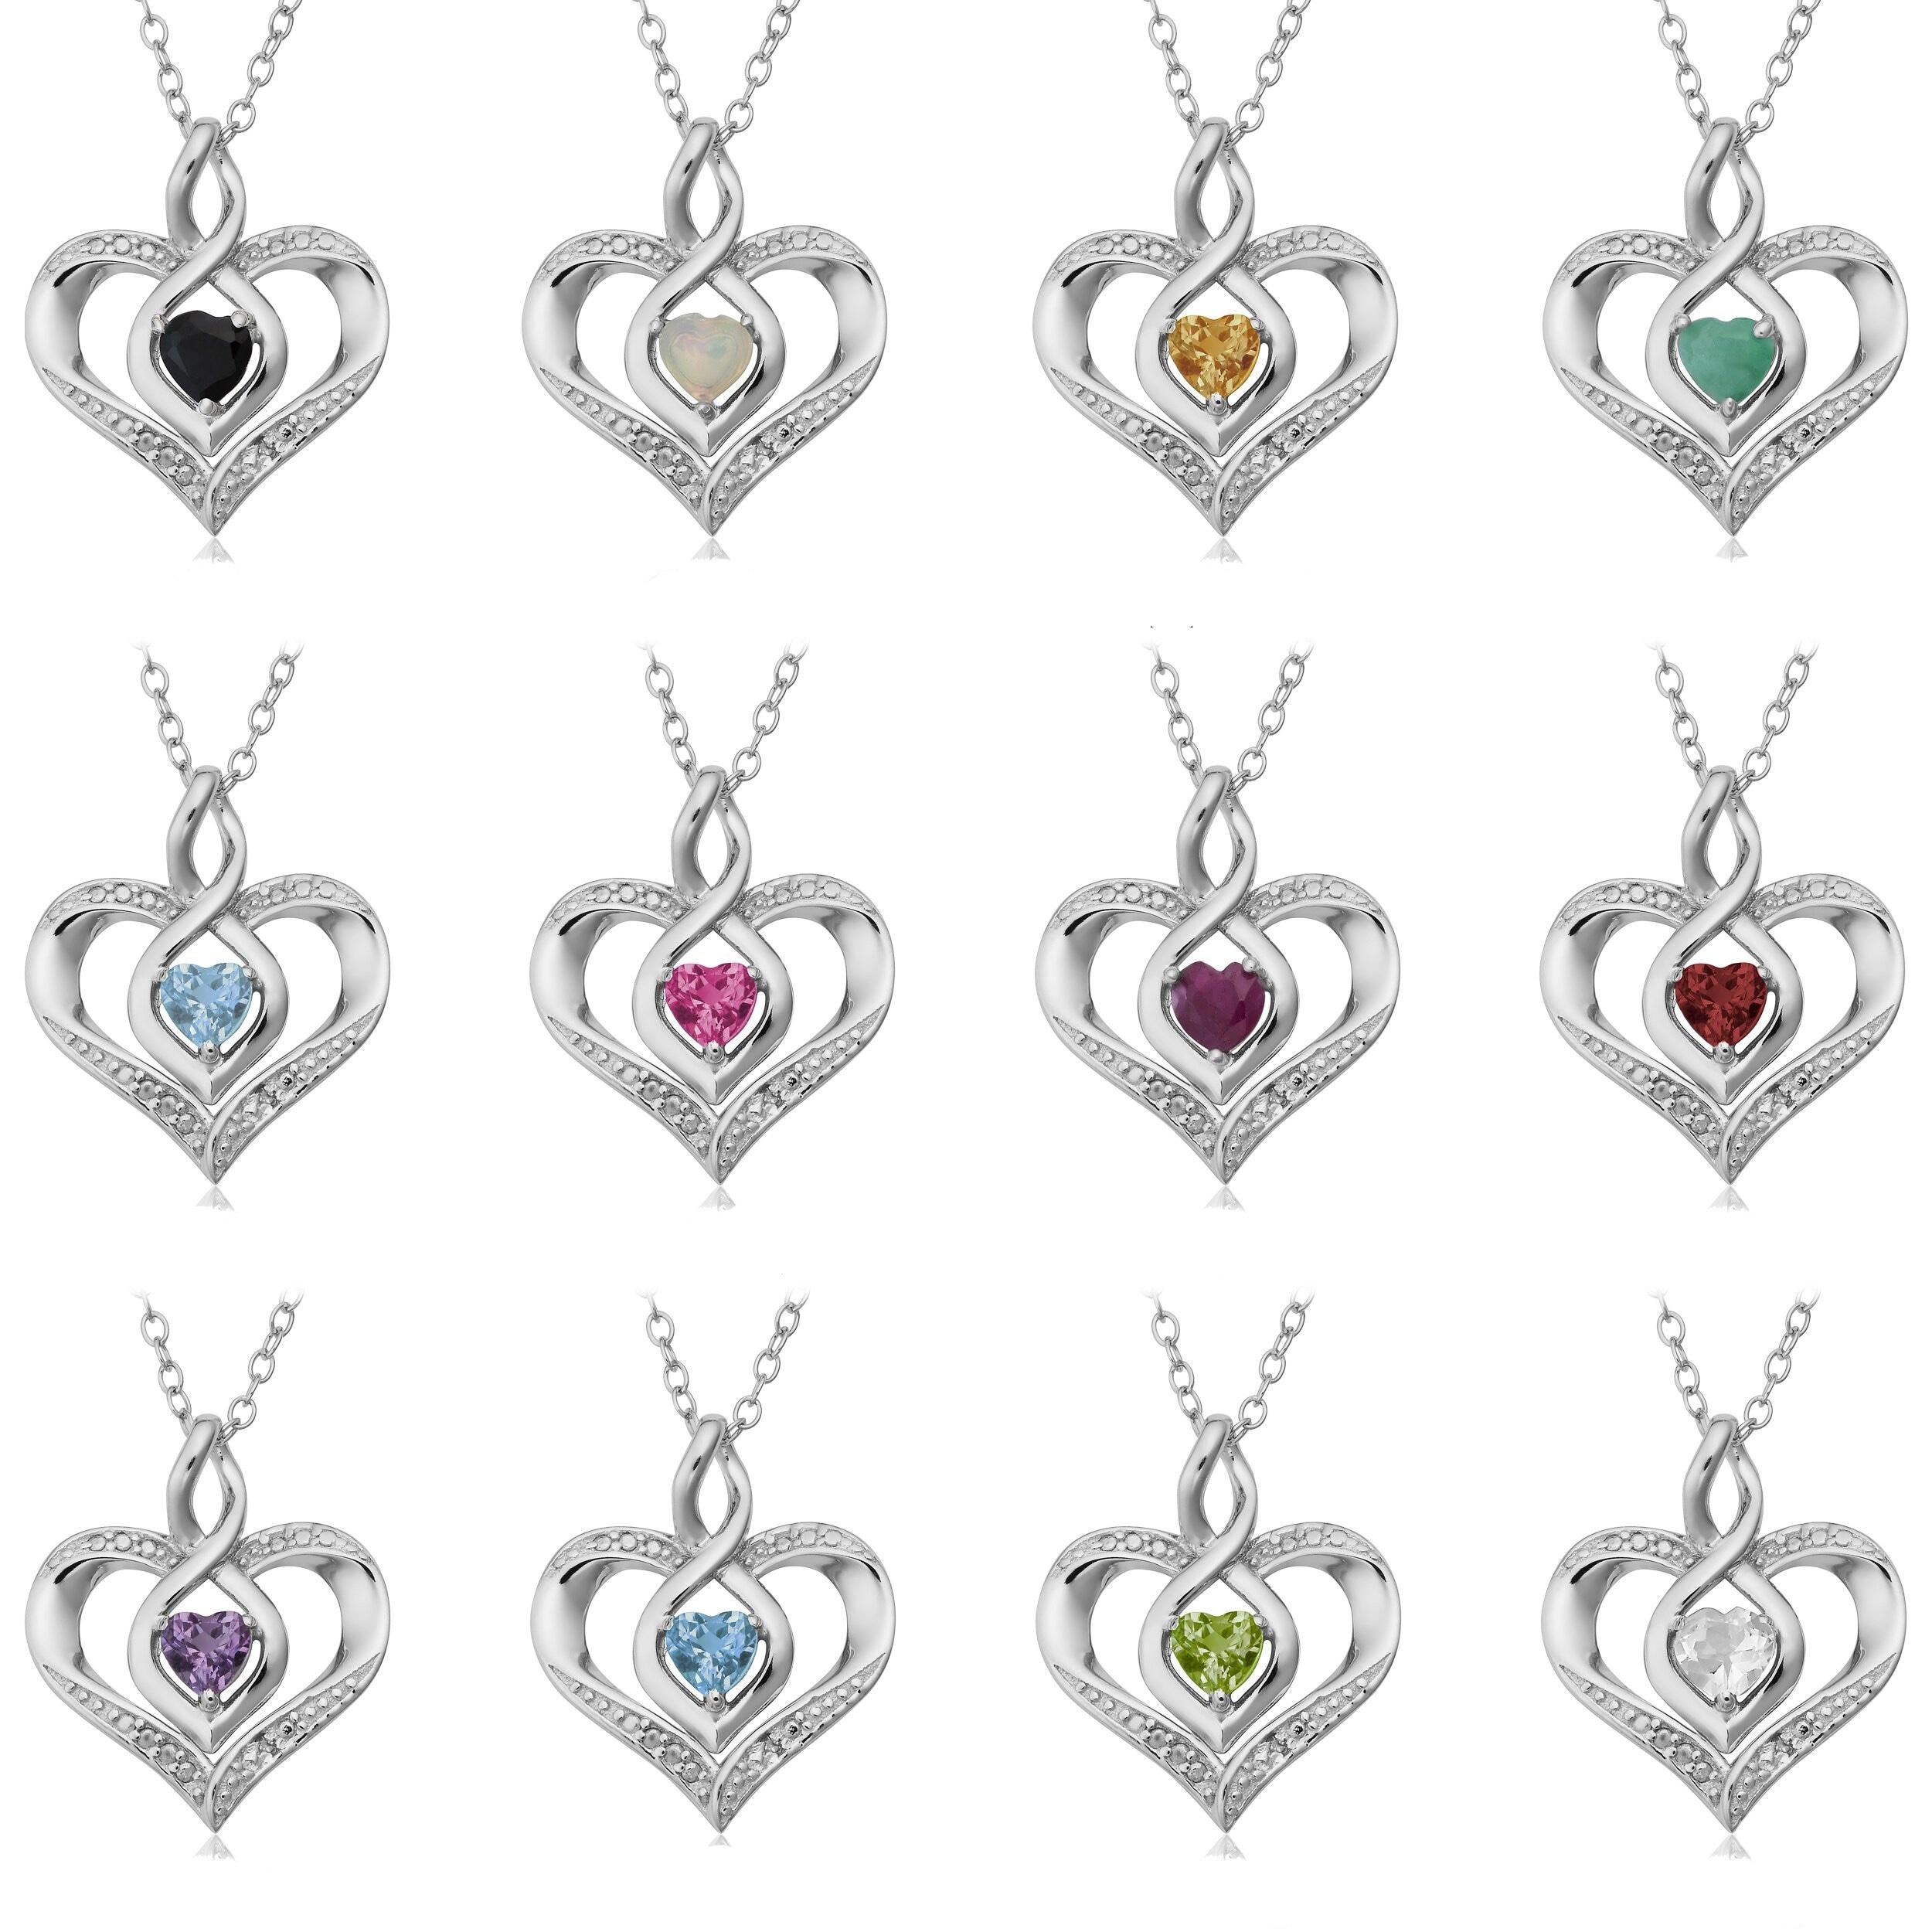 Sterling Silver Rhodium Plated Childs Preciosca Crystal Mar Heart Earrings